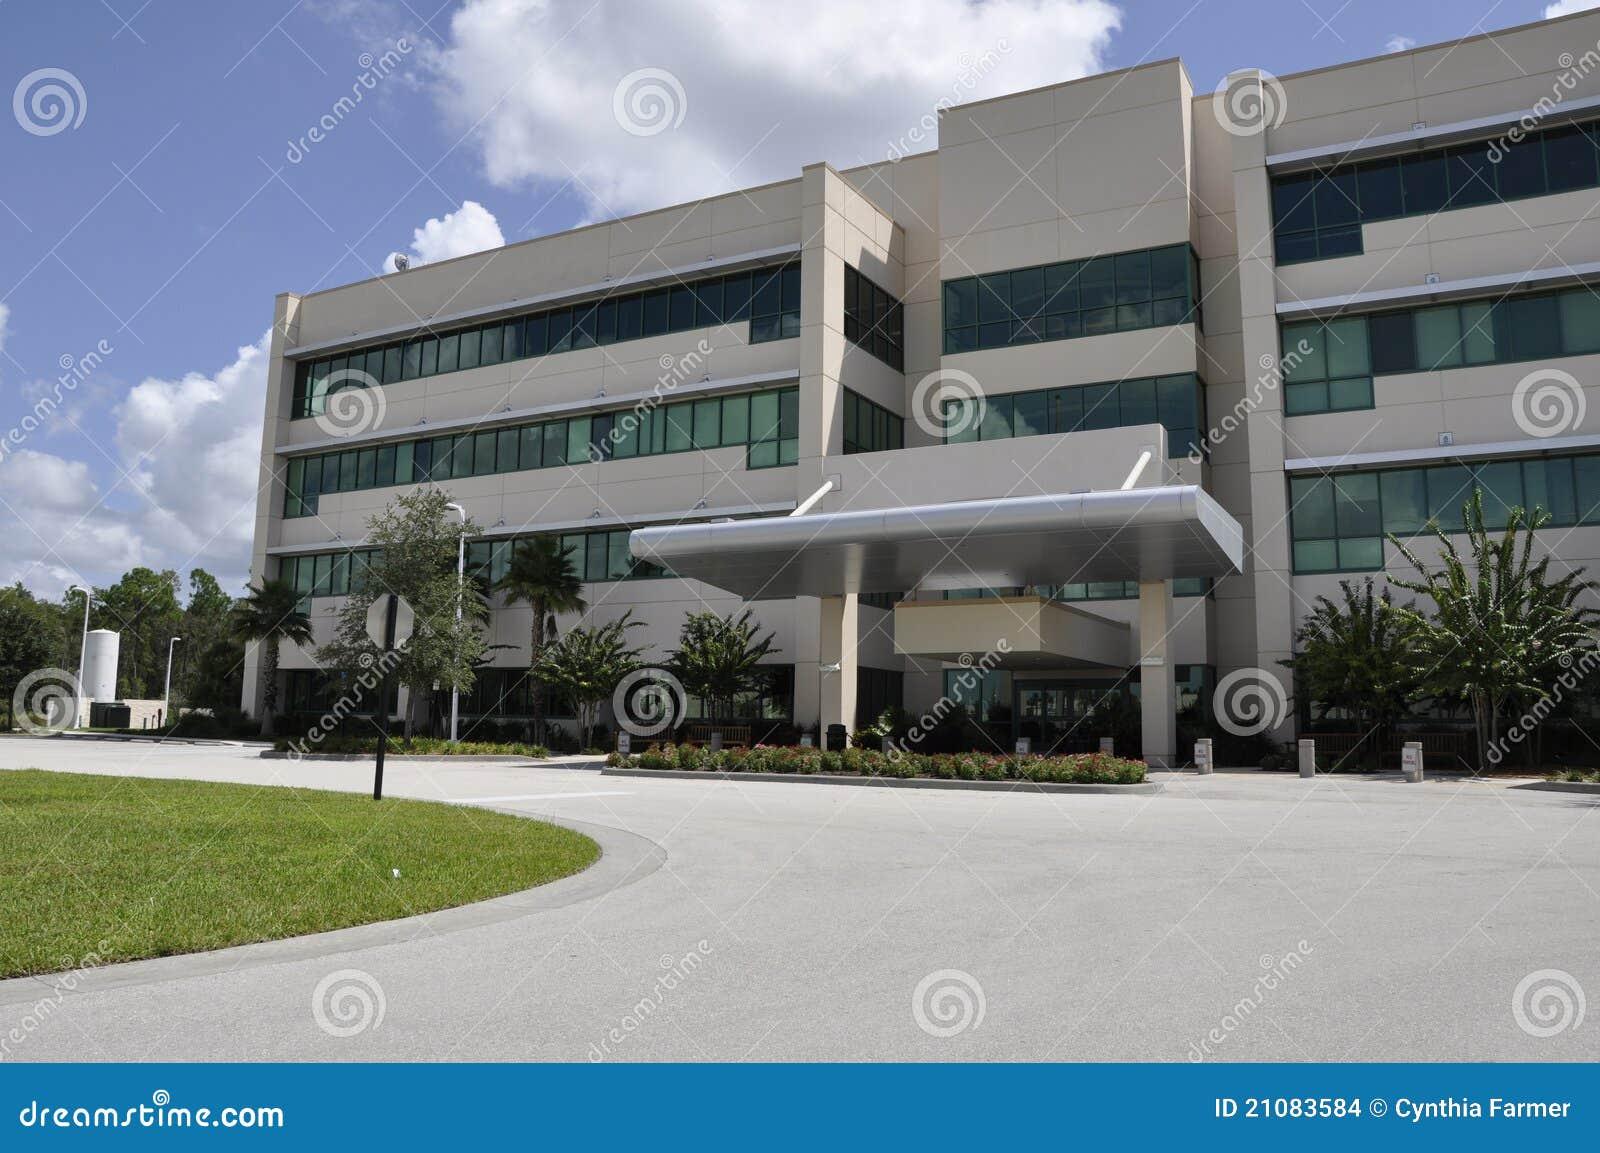 Exterior Moderno Del Hospital Imagenes De Archivo Imagen 21083584